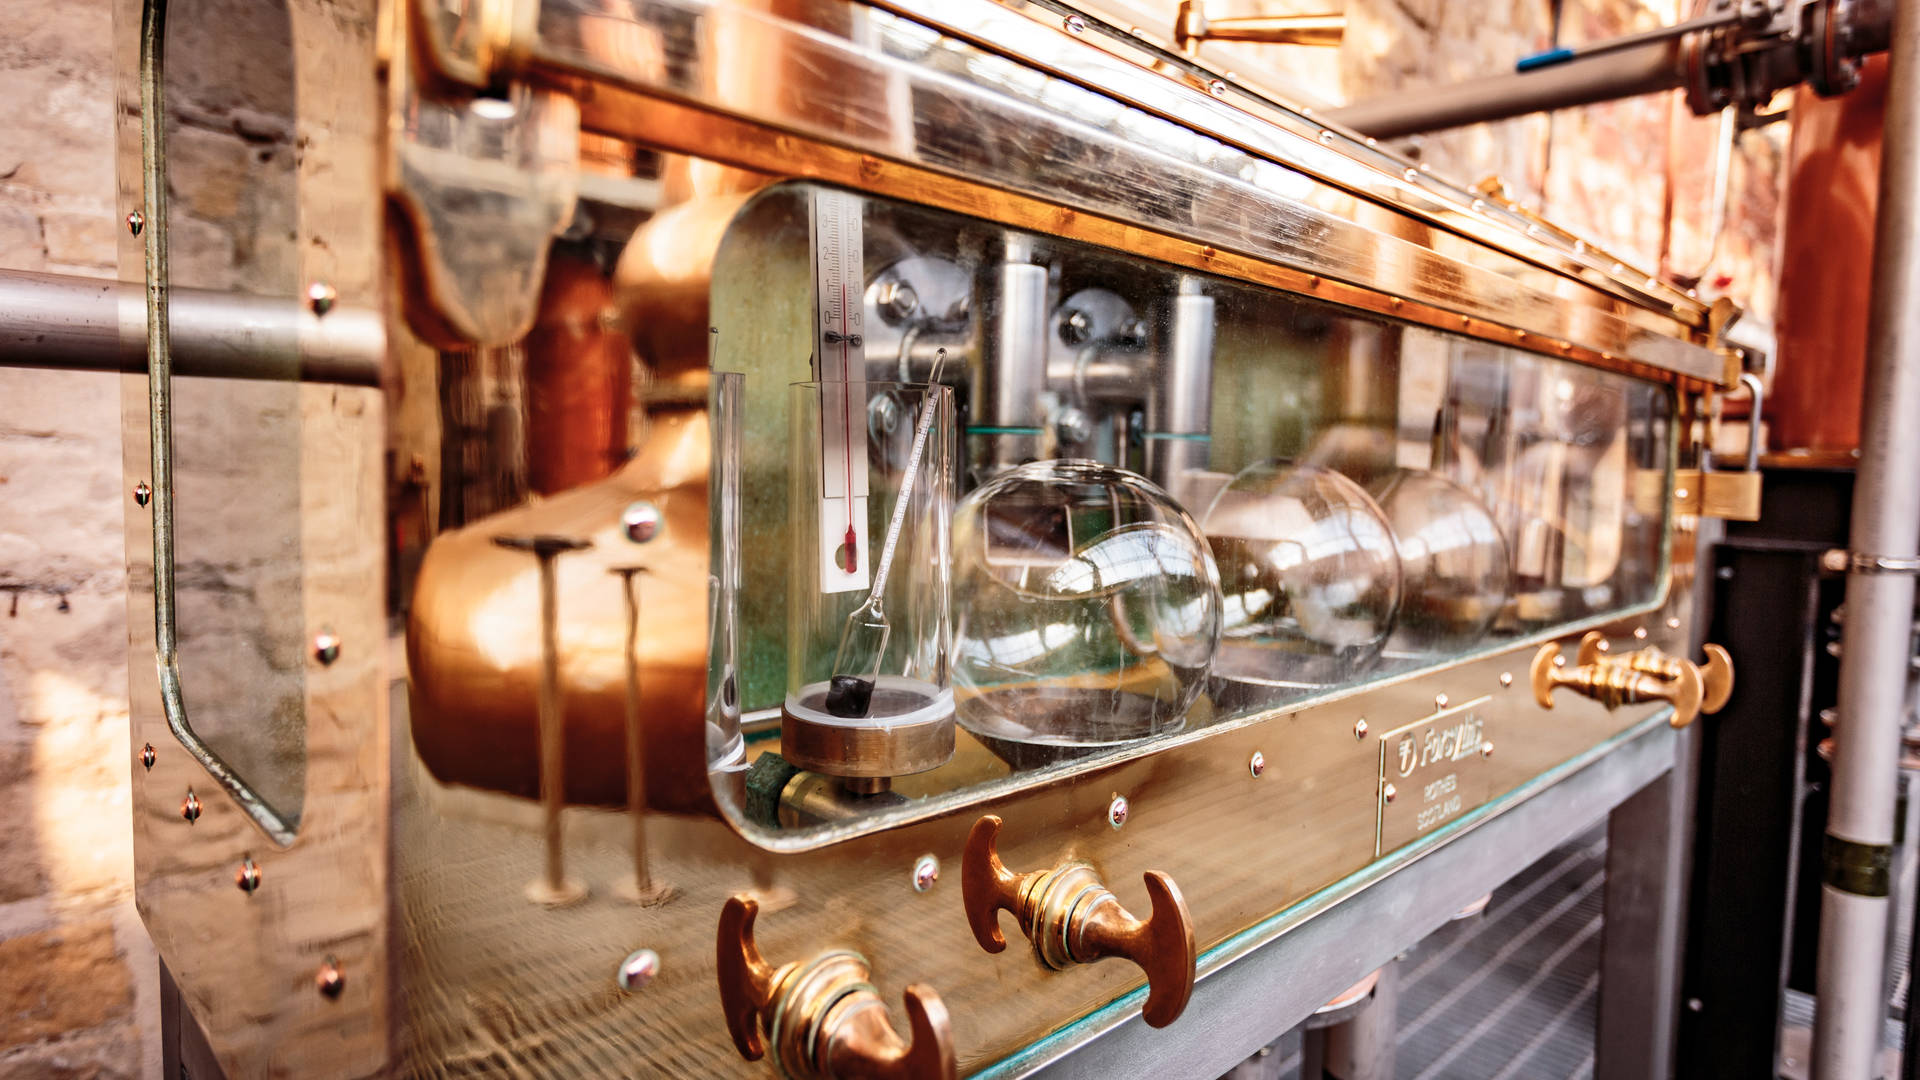 Whiskydistilleerderij